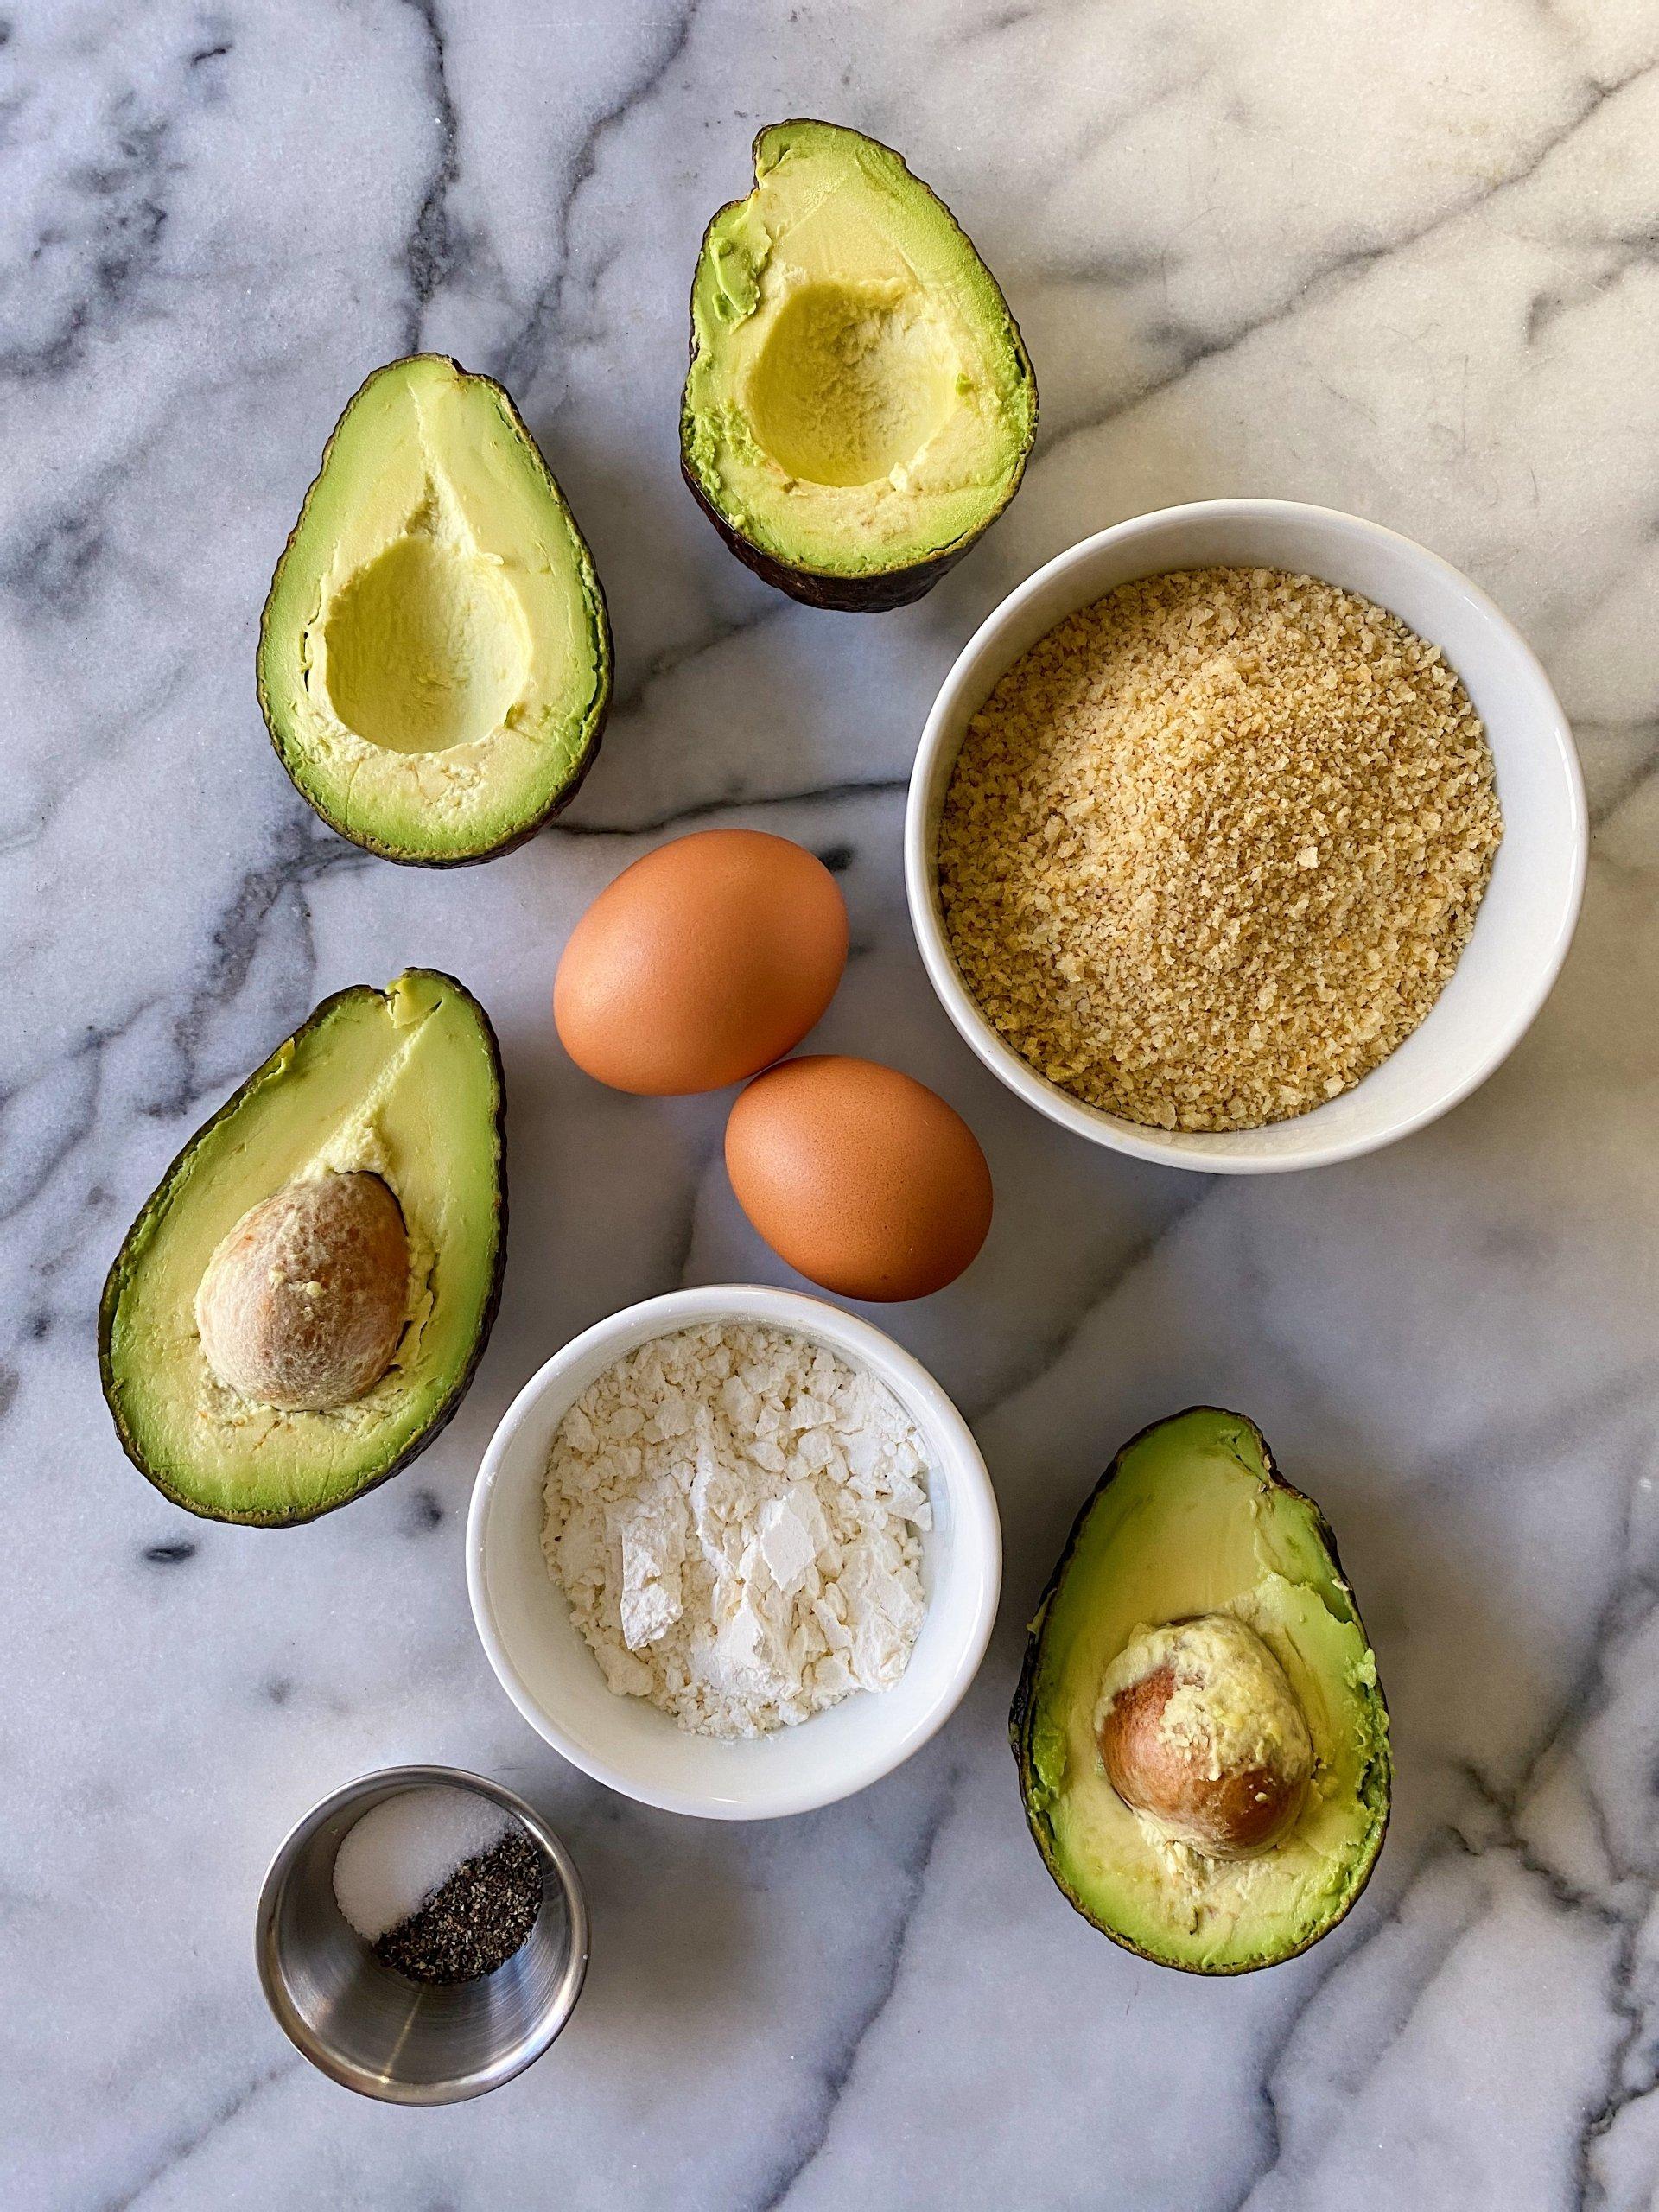 crispy baked avocado tacos gluten free #glutenfreerecipes www.healthygffamily.com